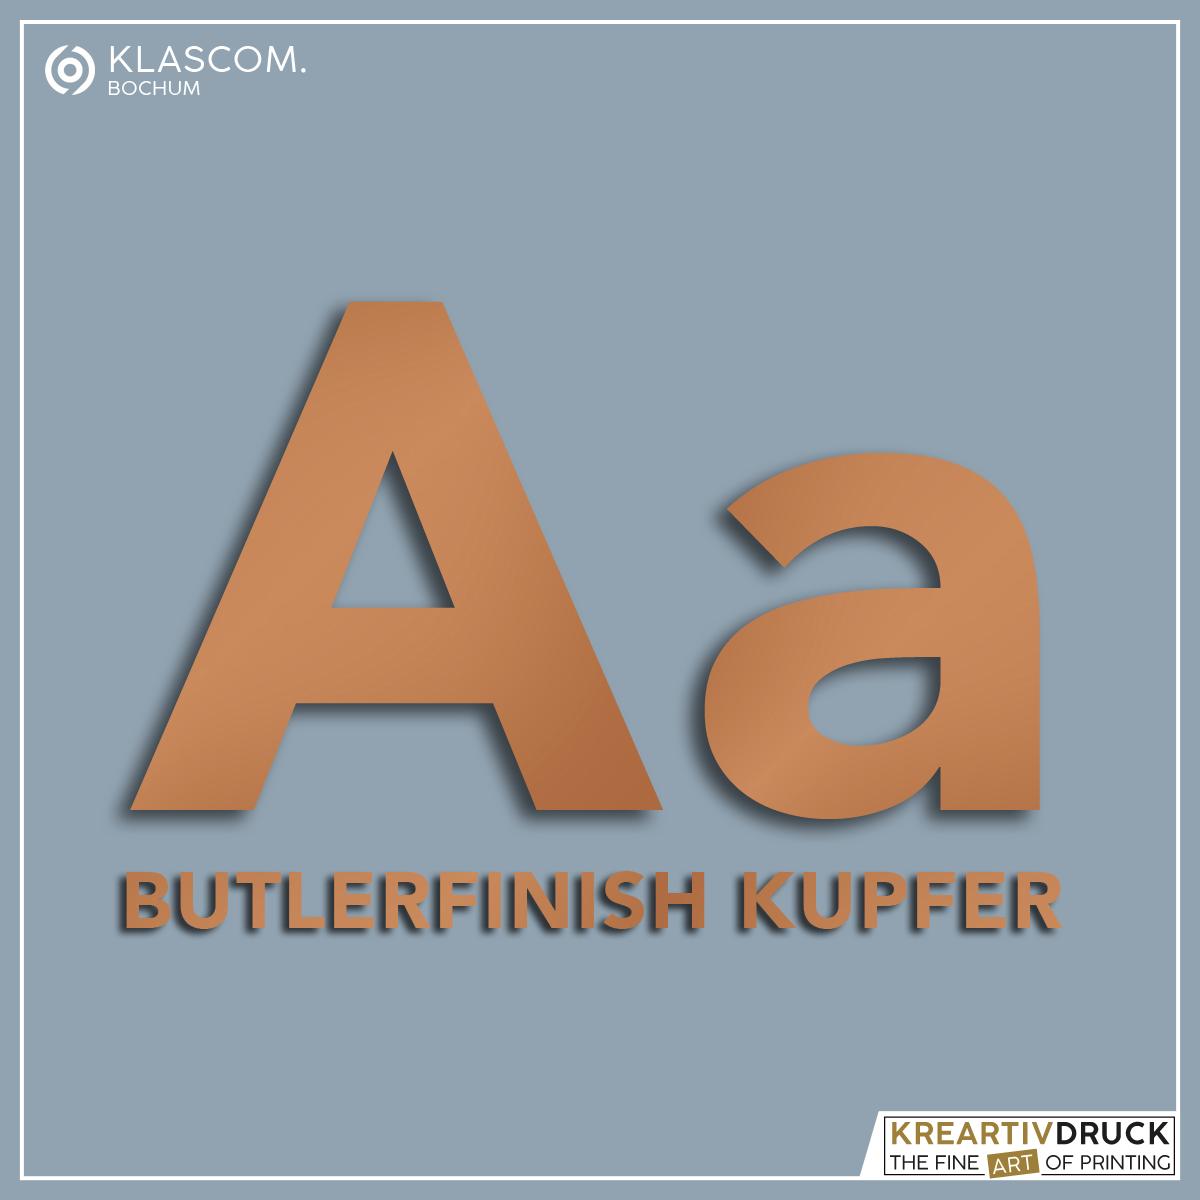 butlerfinish_kupfer